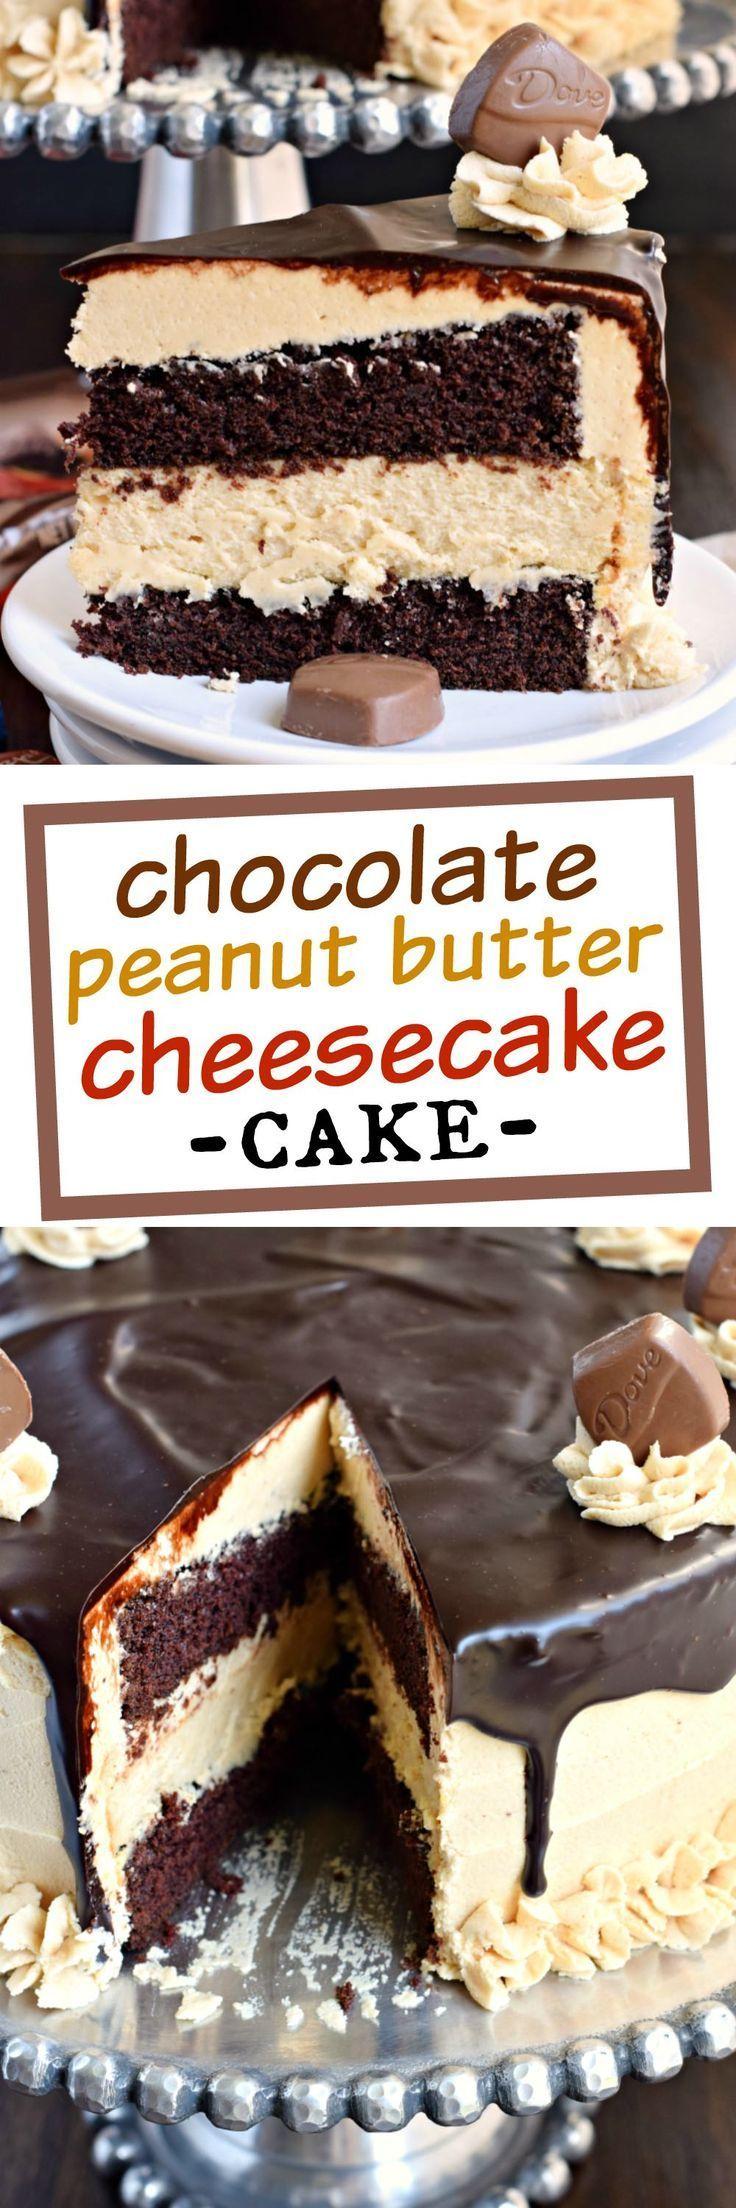 images about Peanut butter on Pinterest | Peanut butter, Peanut butter ...